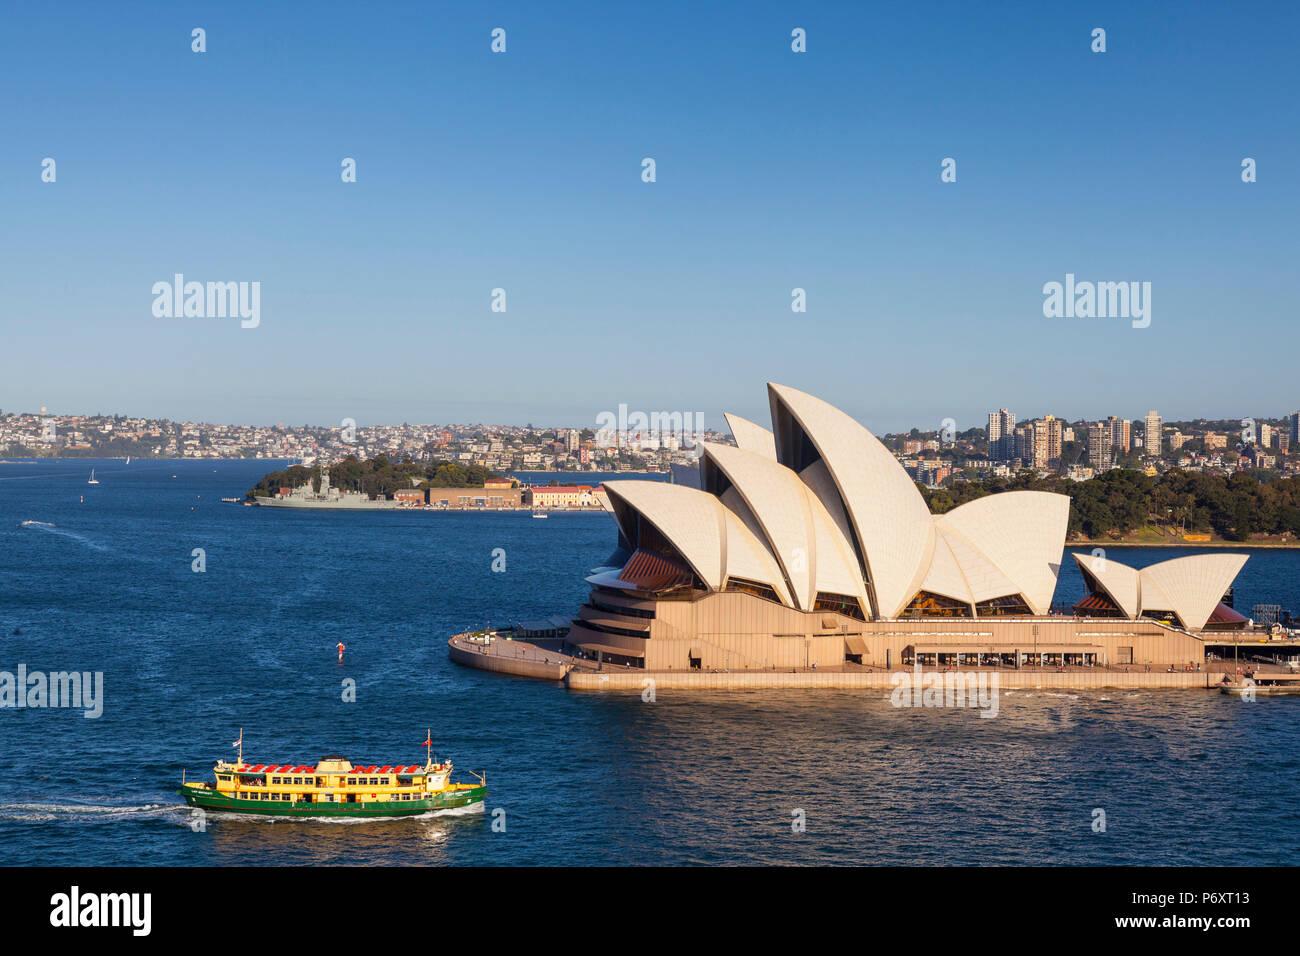 Sydney Opera House, Darling Harbour, Sydney, New South Wales, Australia Stock Photo